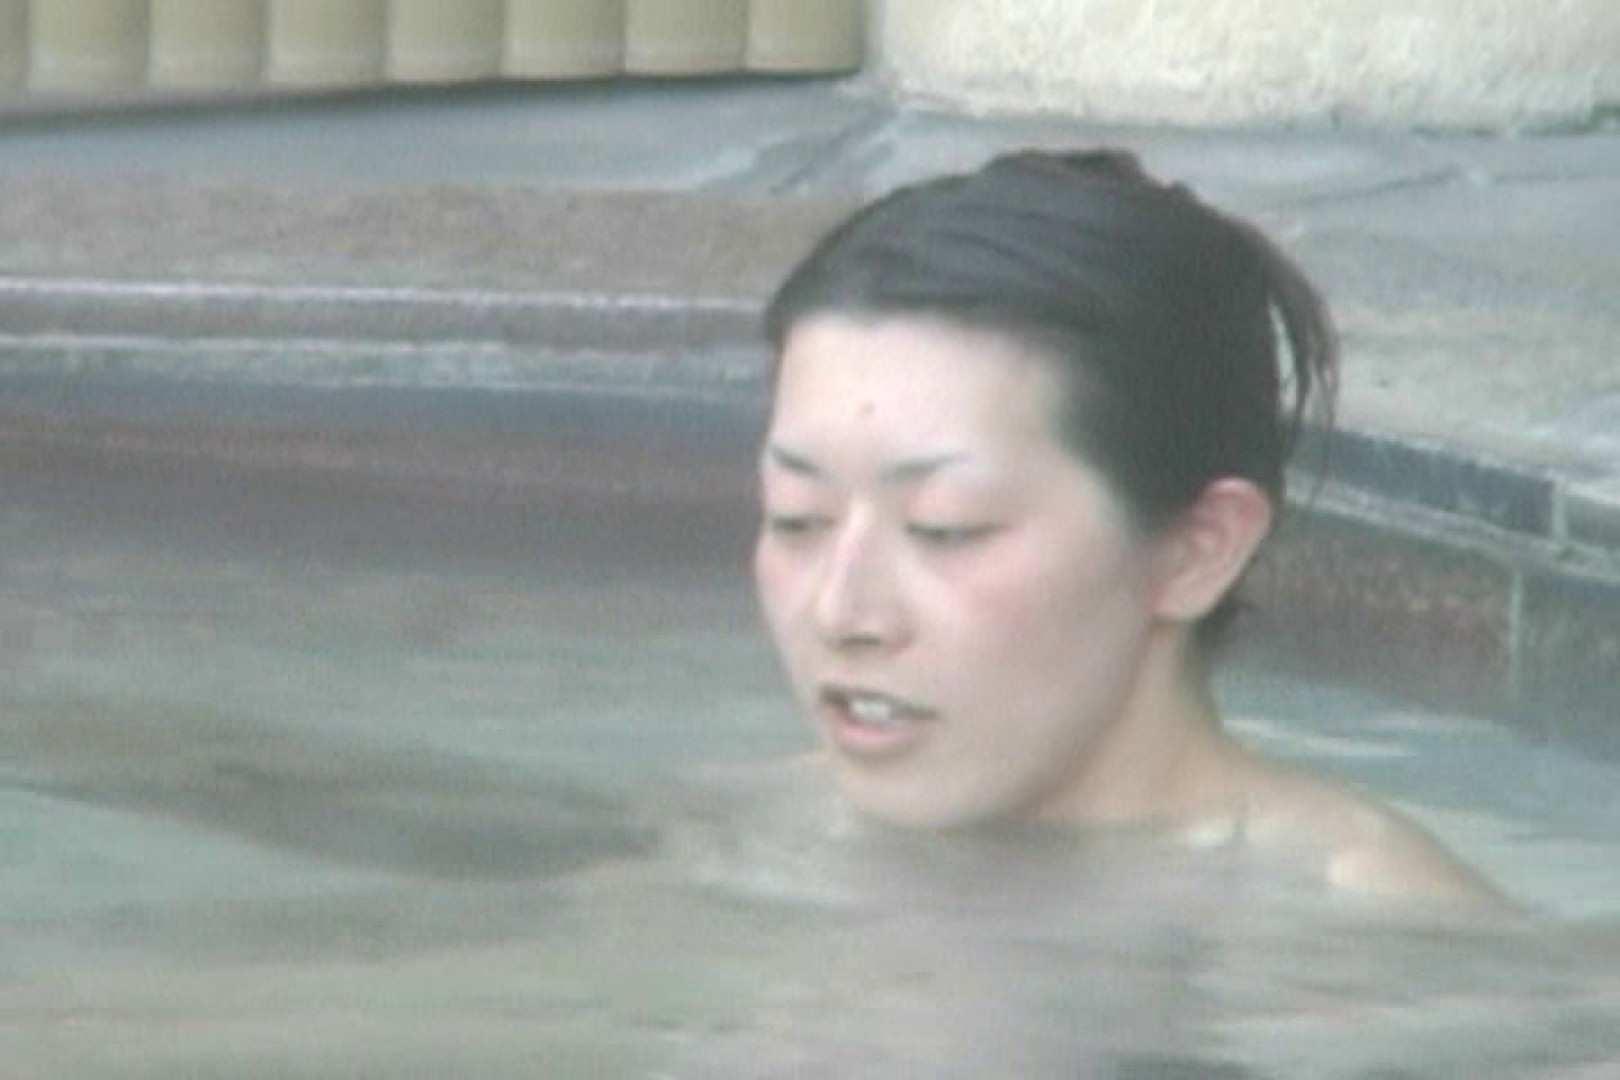 Aquaな露天風呂Vol.589 盗撮シリーズ | 露天風呂編  113PIX 31